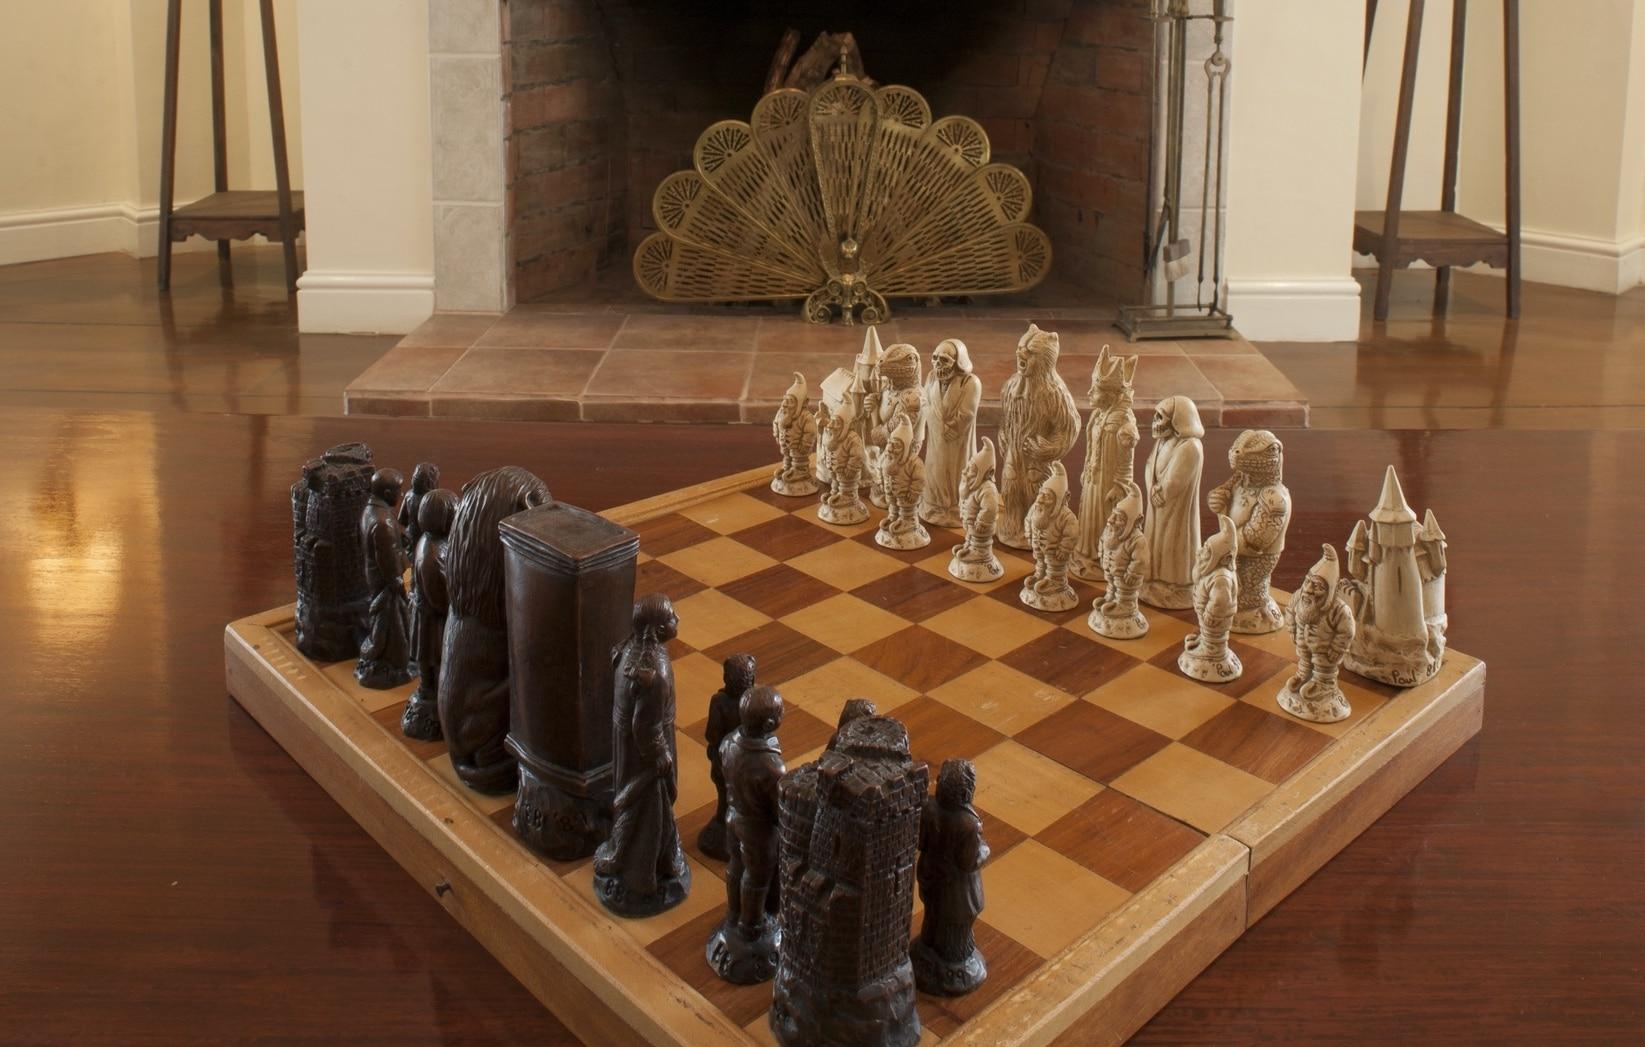 Frangeli House Baguio Chess